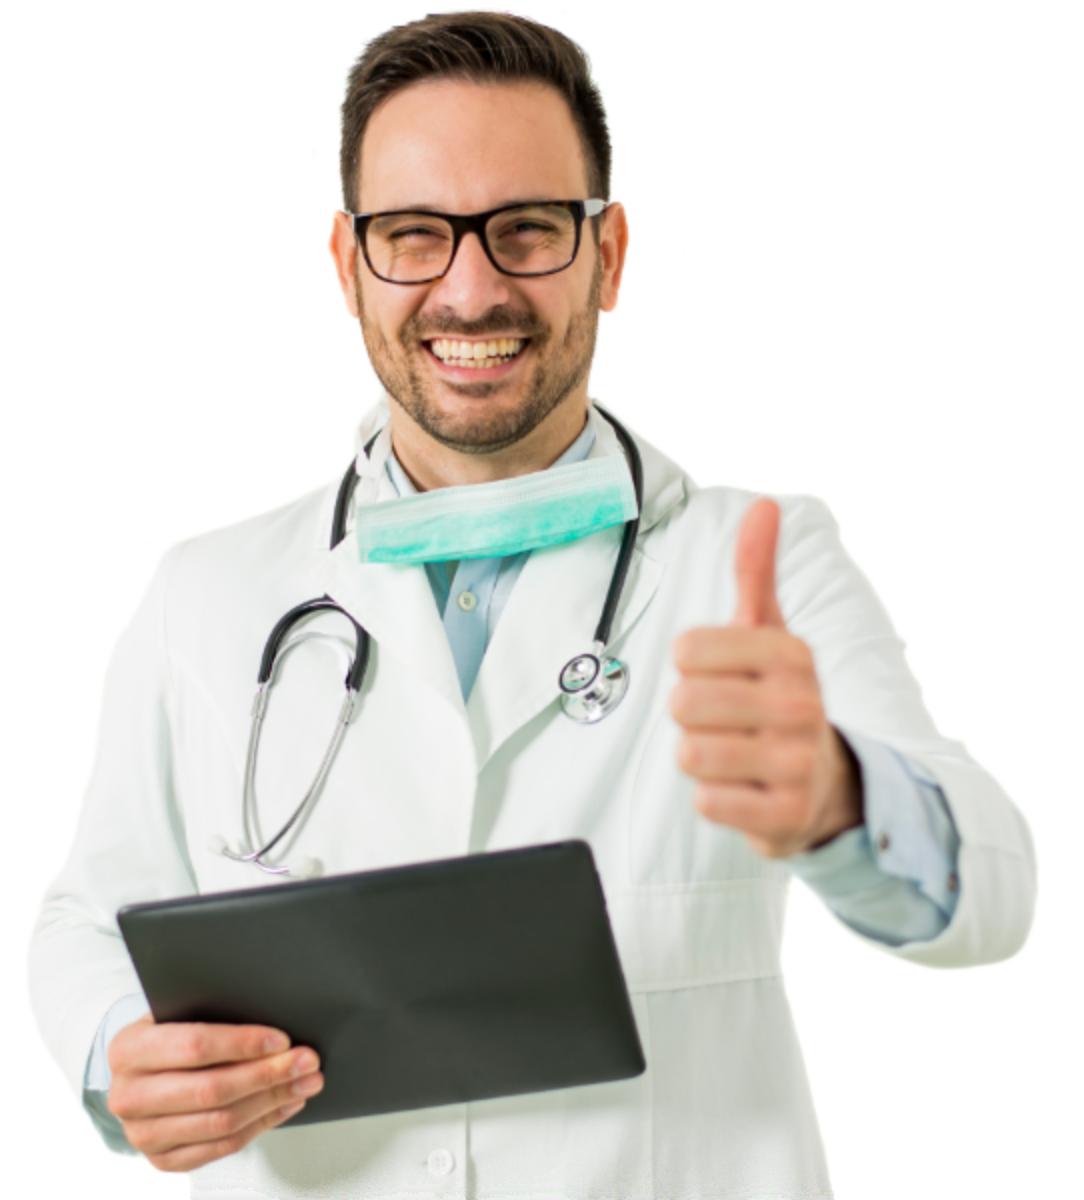 Medical image